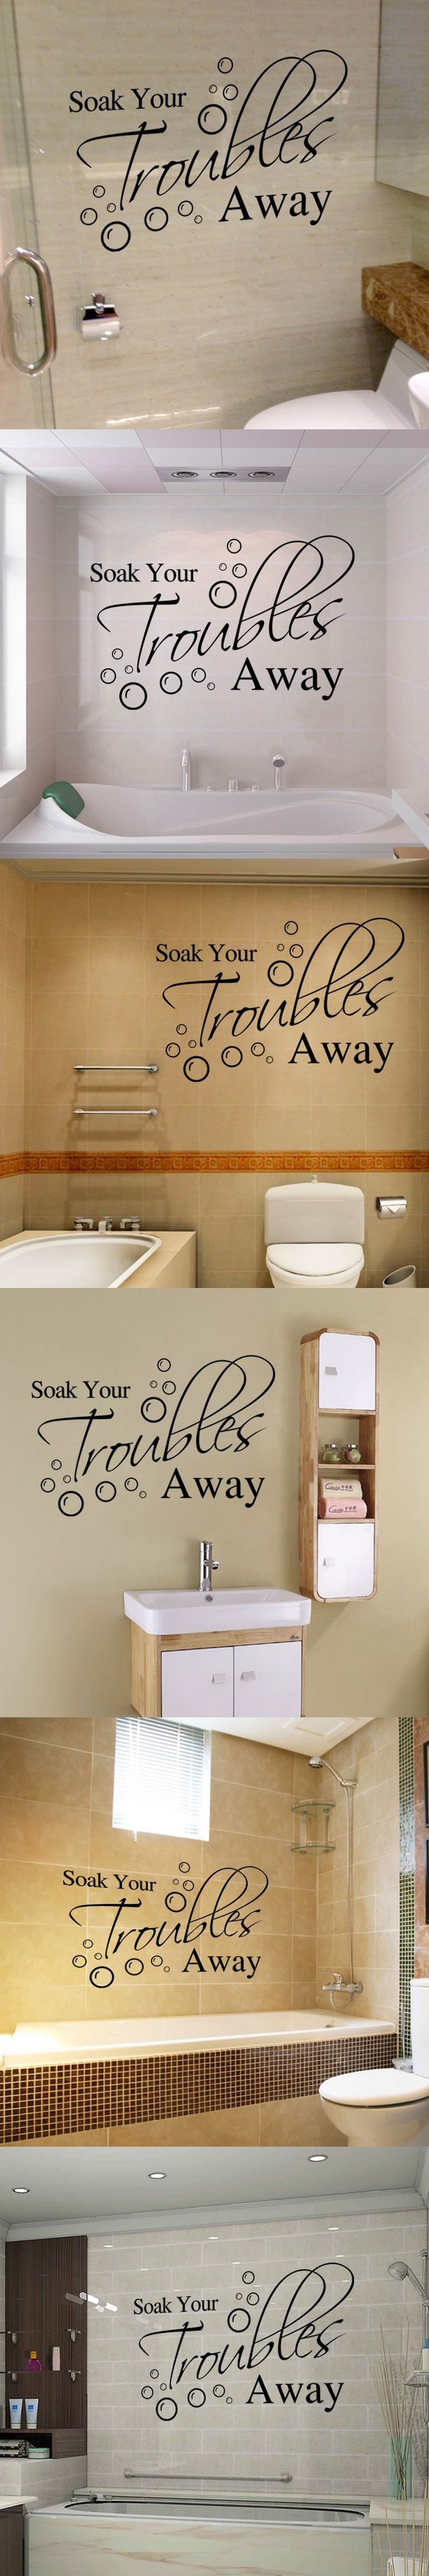 Best 25 Bathroom wall stickers ideas on Pinterest